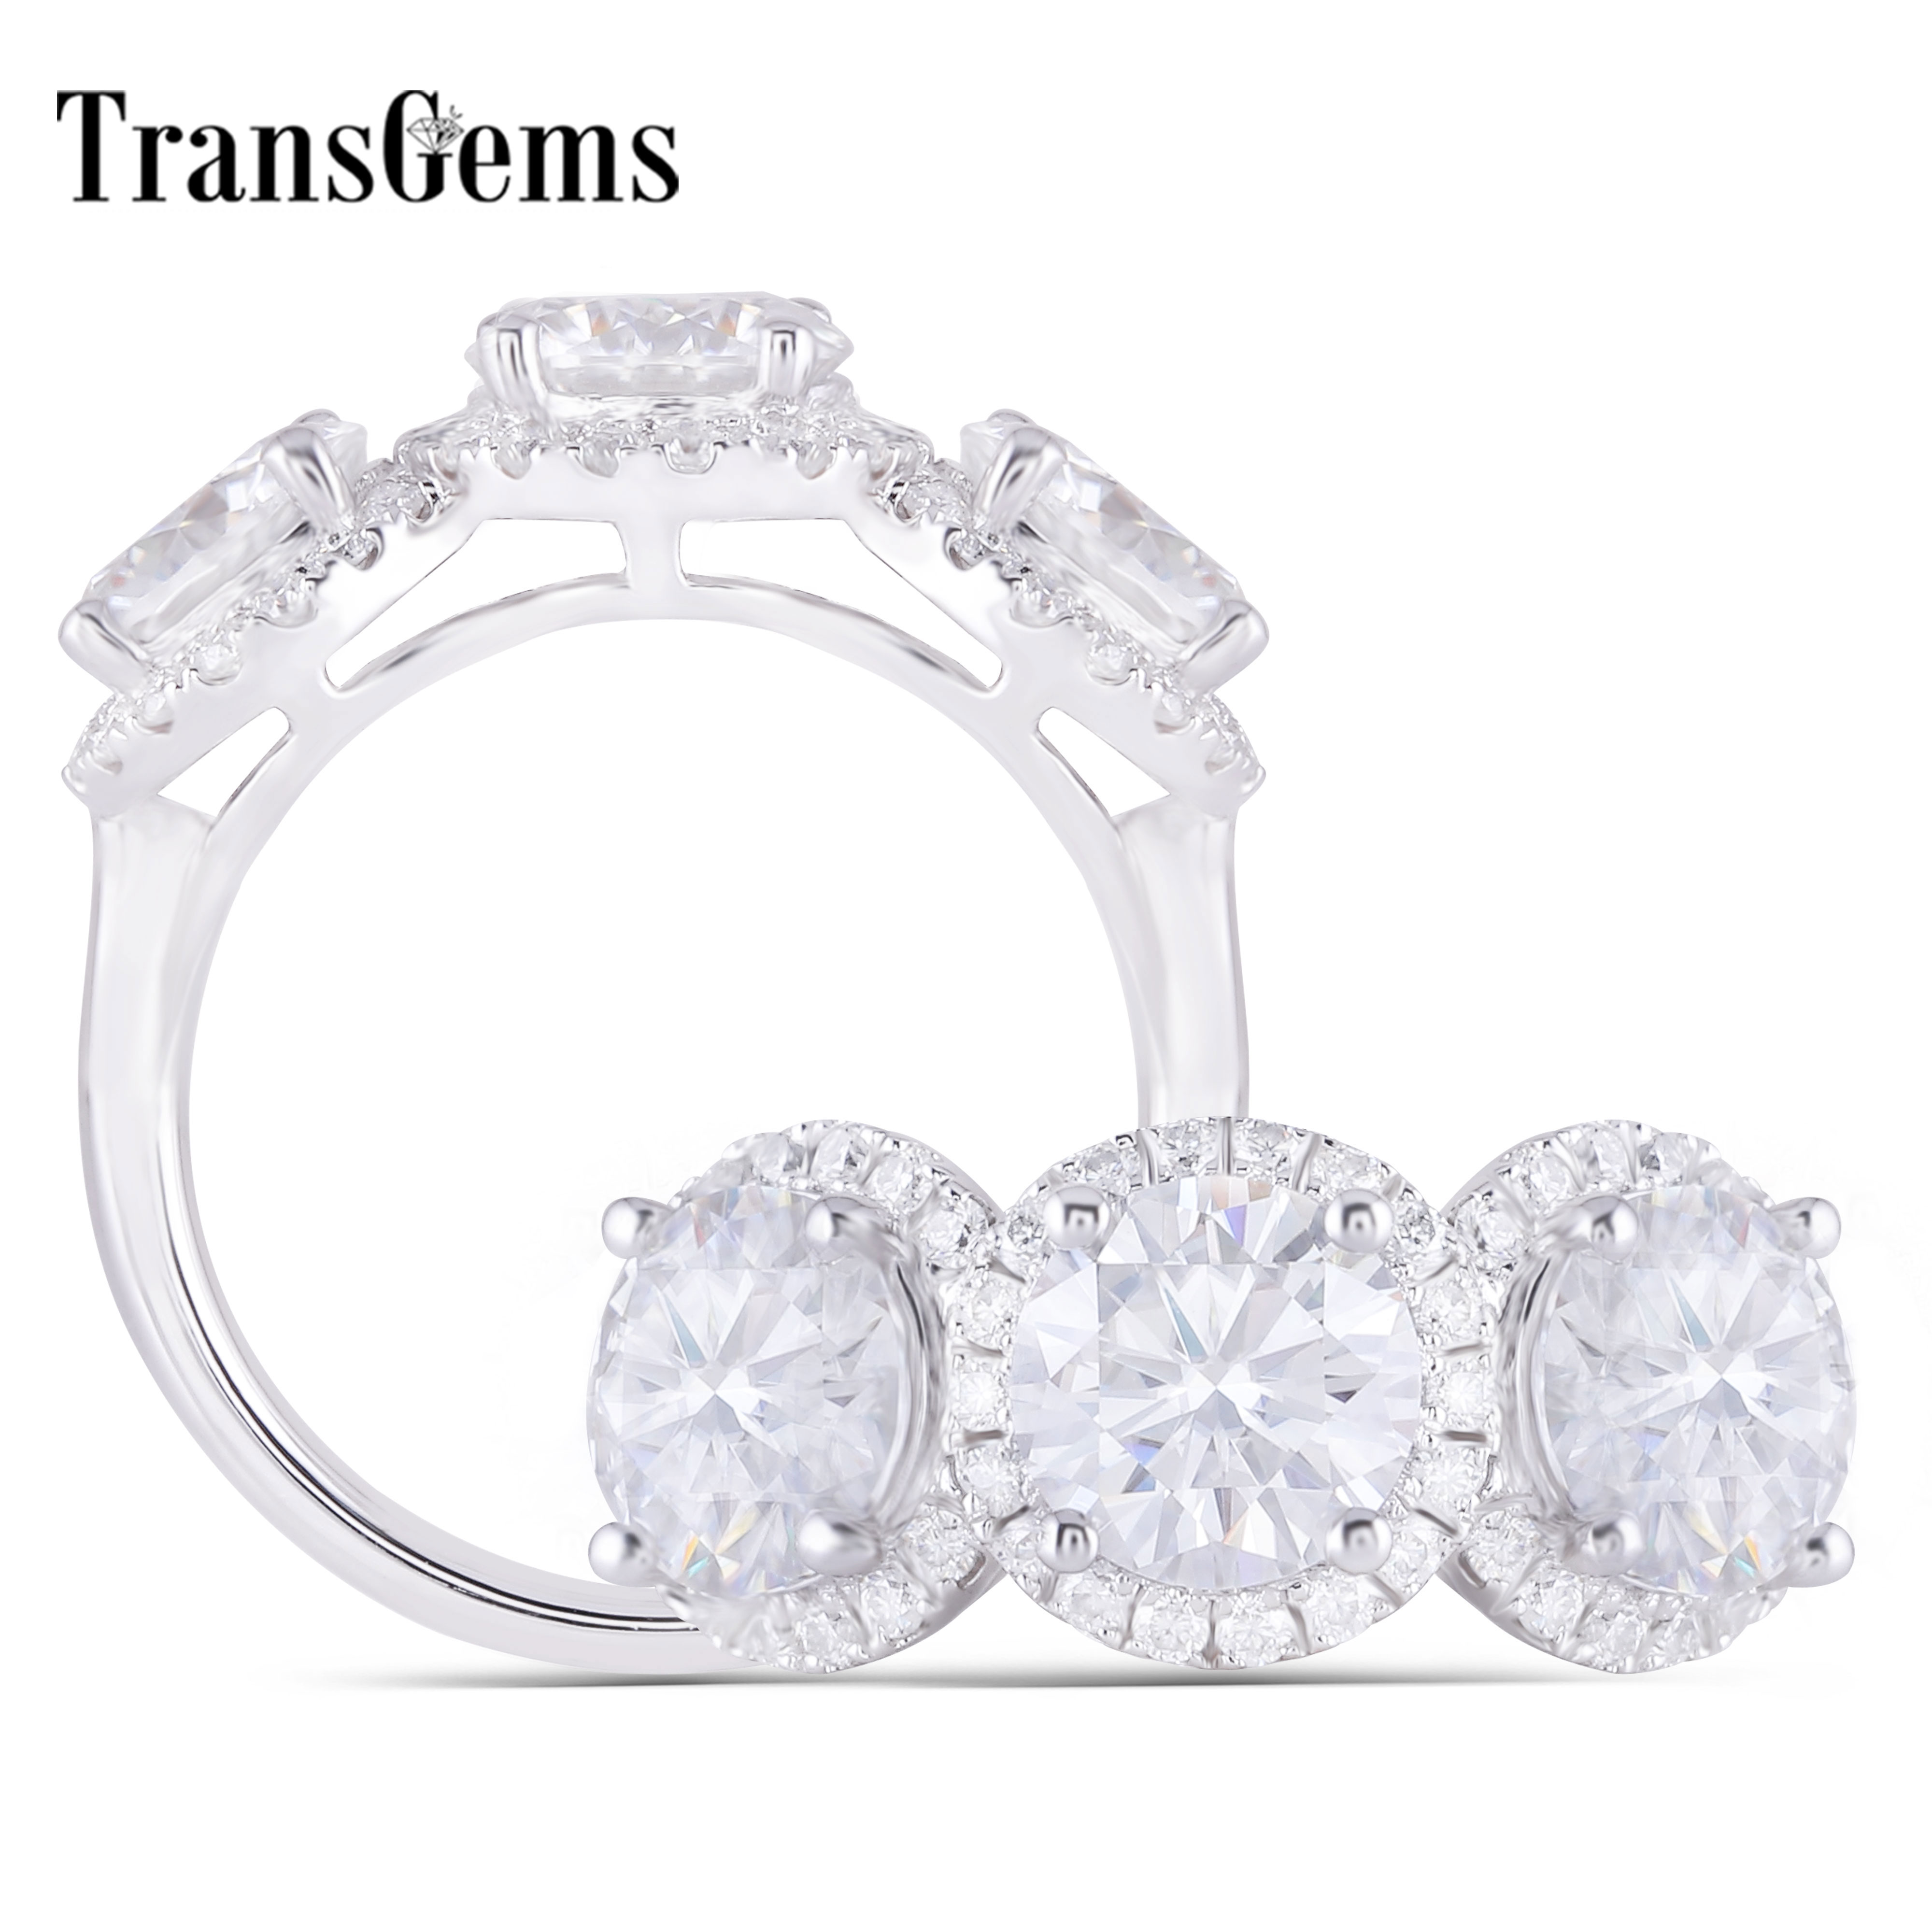 Transgems 14K 585 White Gold Main 3CTW 6.5mm*3pcs F Color Halo Moissanite 3 Stone Engagement Rings for Women